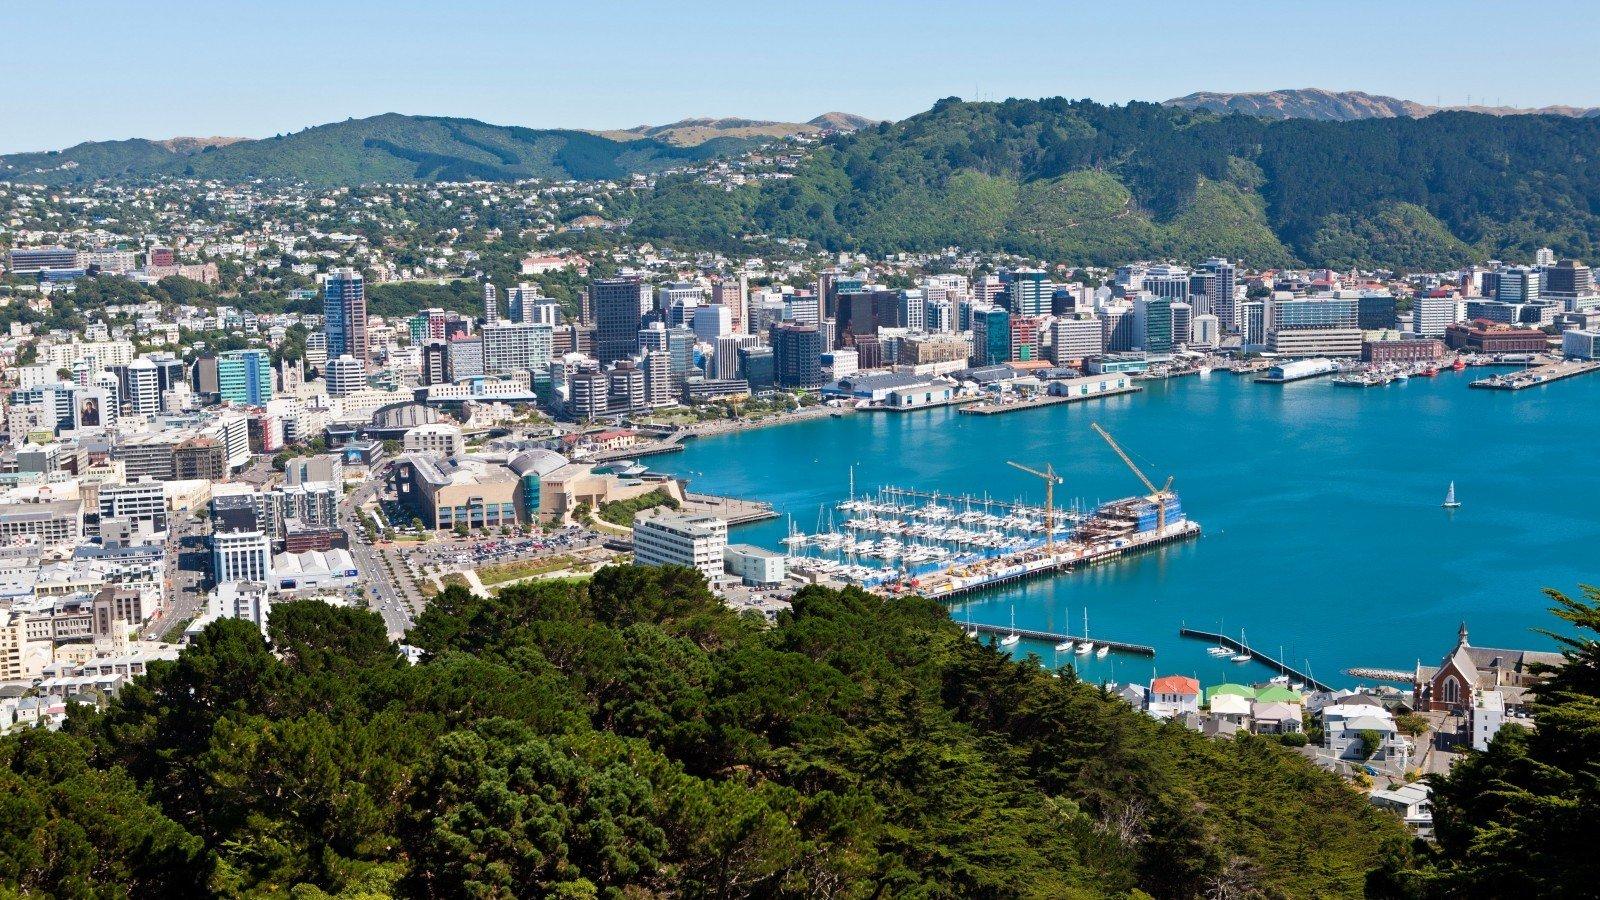 Download 1600x900 Cityscape New Zealand Wellington Coast 1600x900